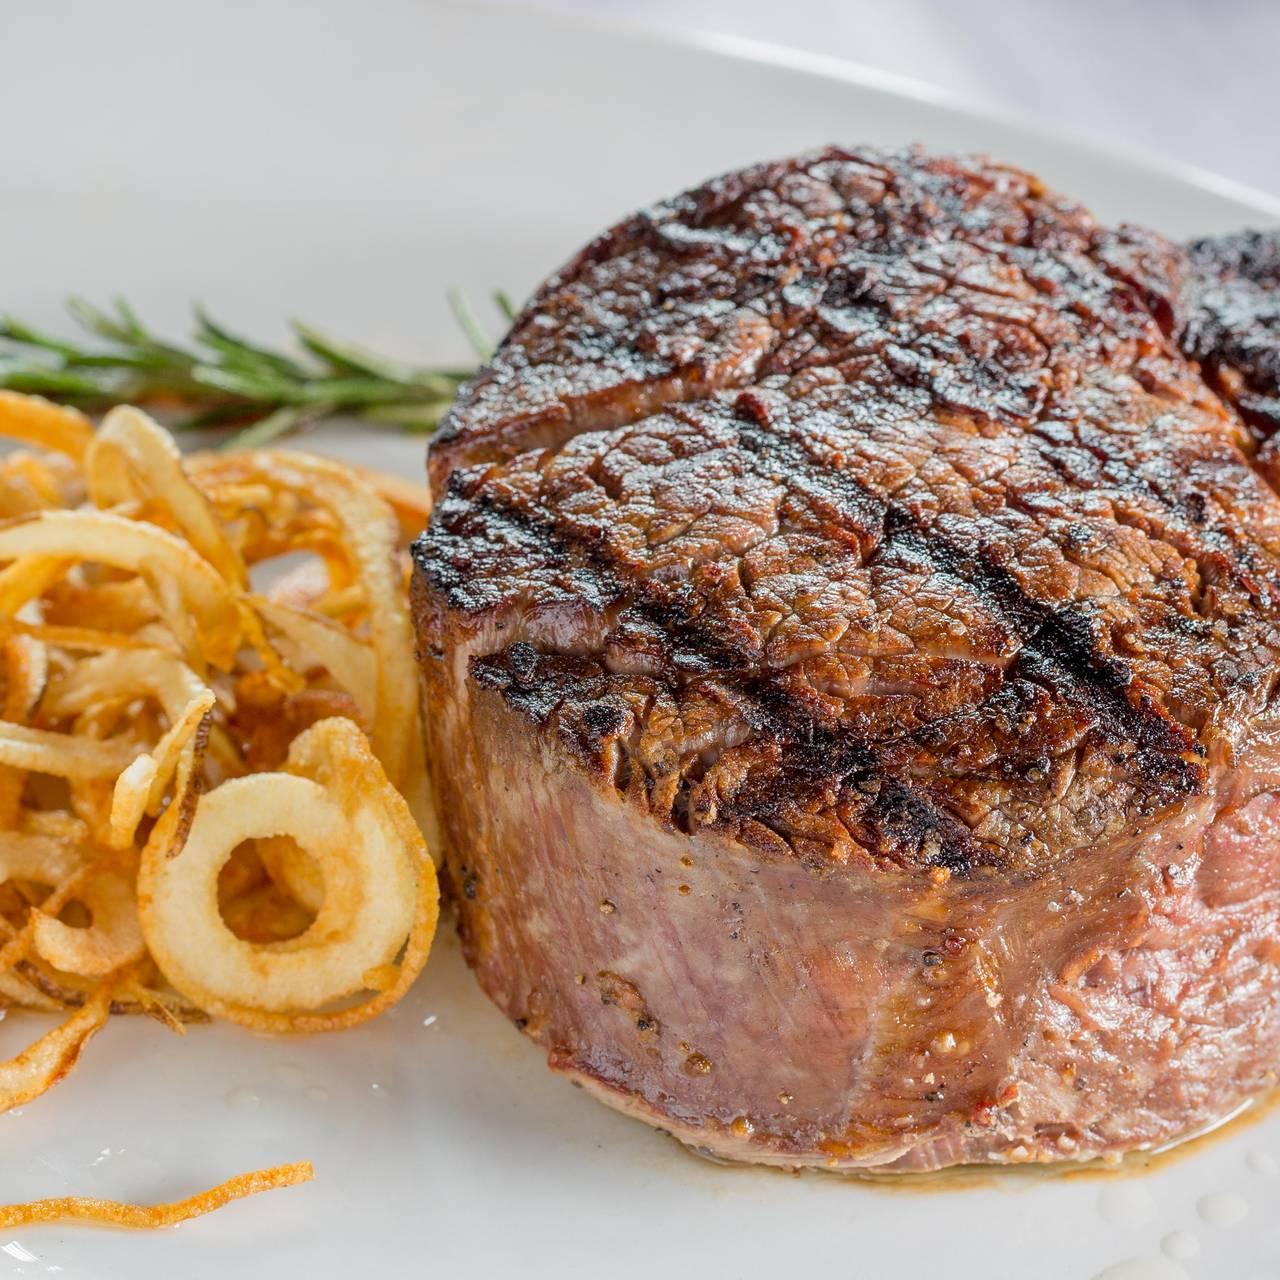 empire steakhouse - 237 west 54 street off of broadway restaurant